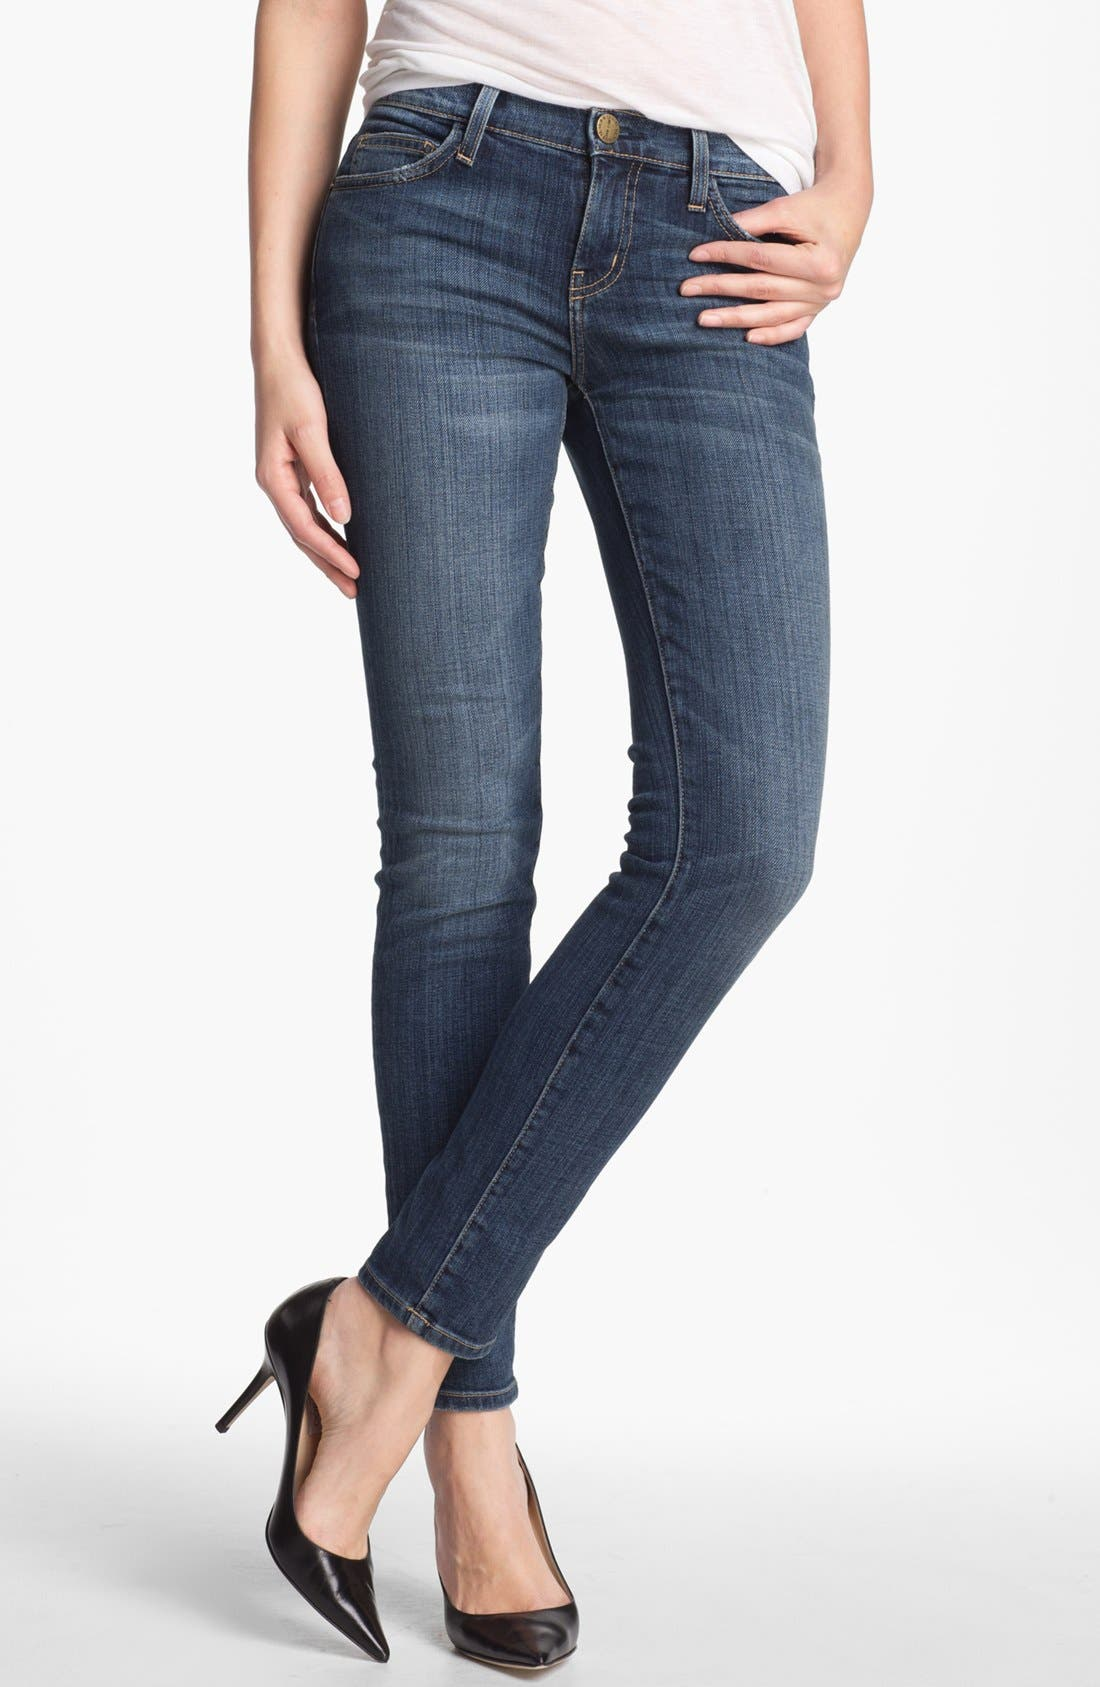 Alternate Image 1 Selected - Current/Elliott 'The Ankle' Skinny Jeans (Loved)